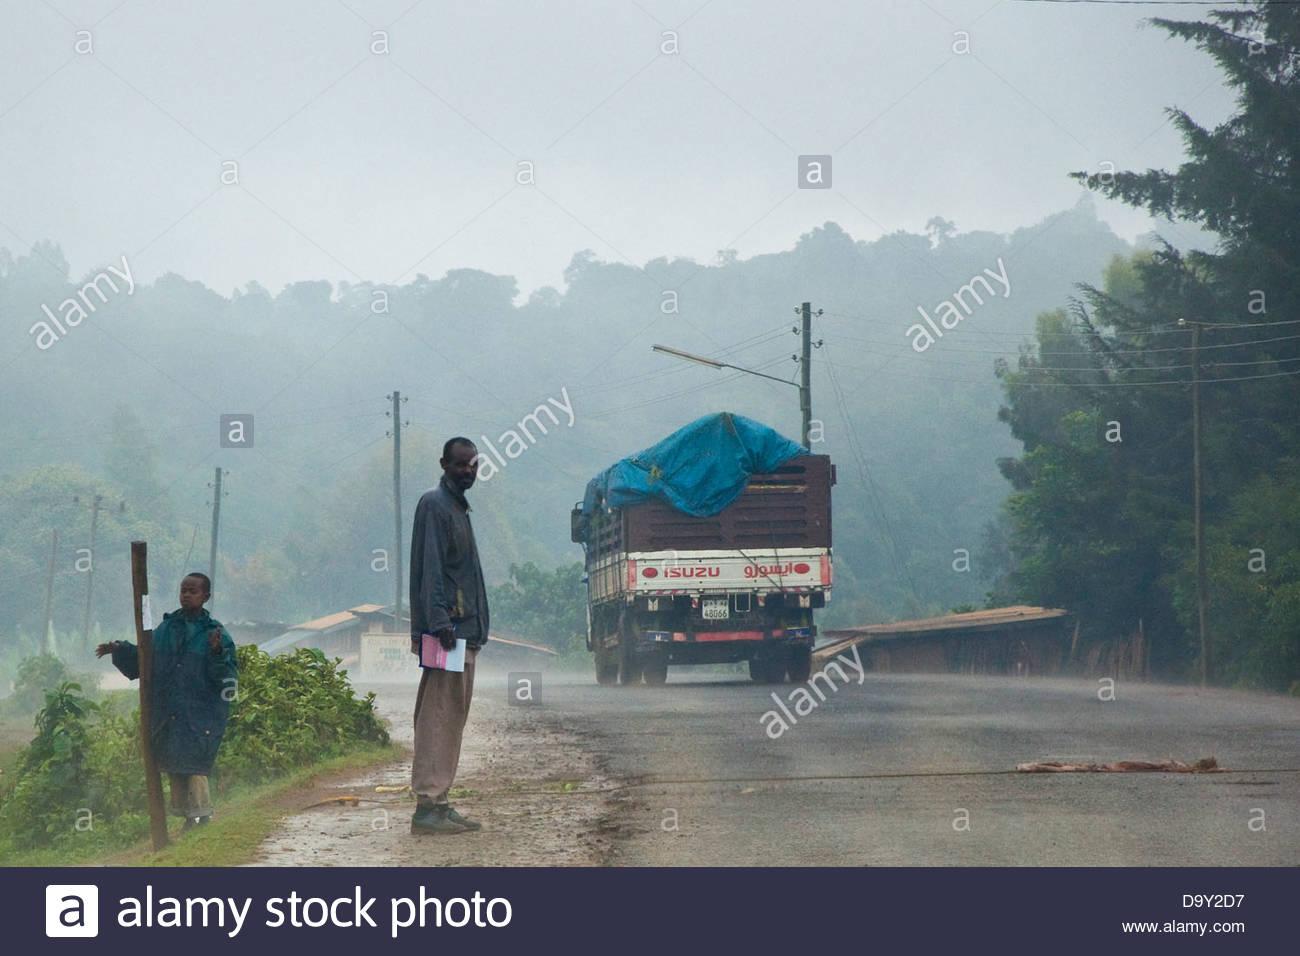 On the road,Surrounding of Awasa,Ethiopia - Stock Image